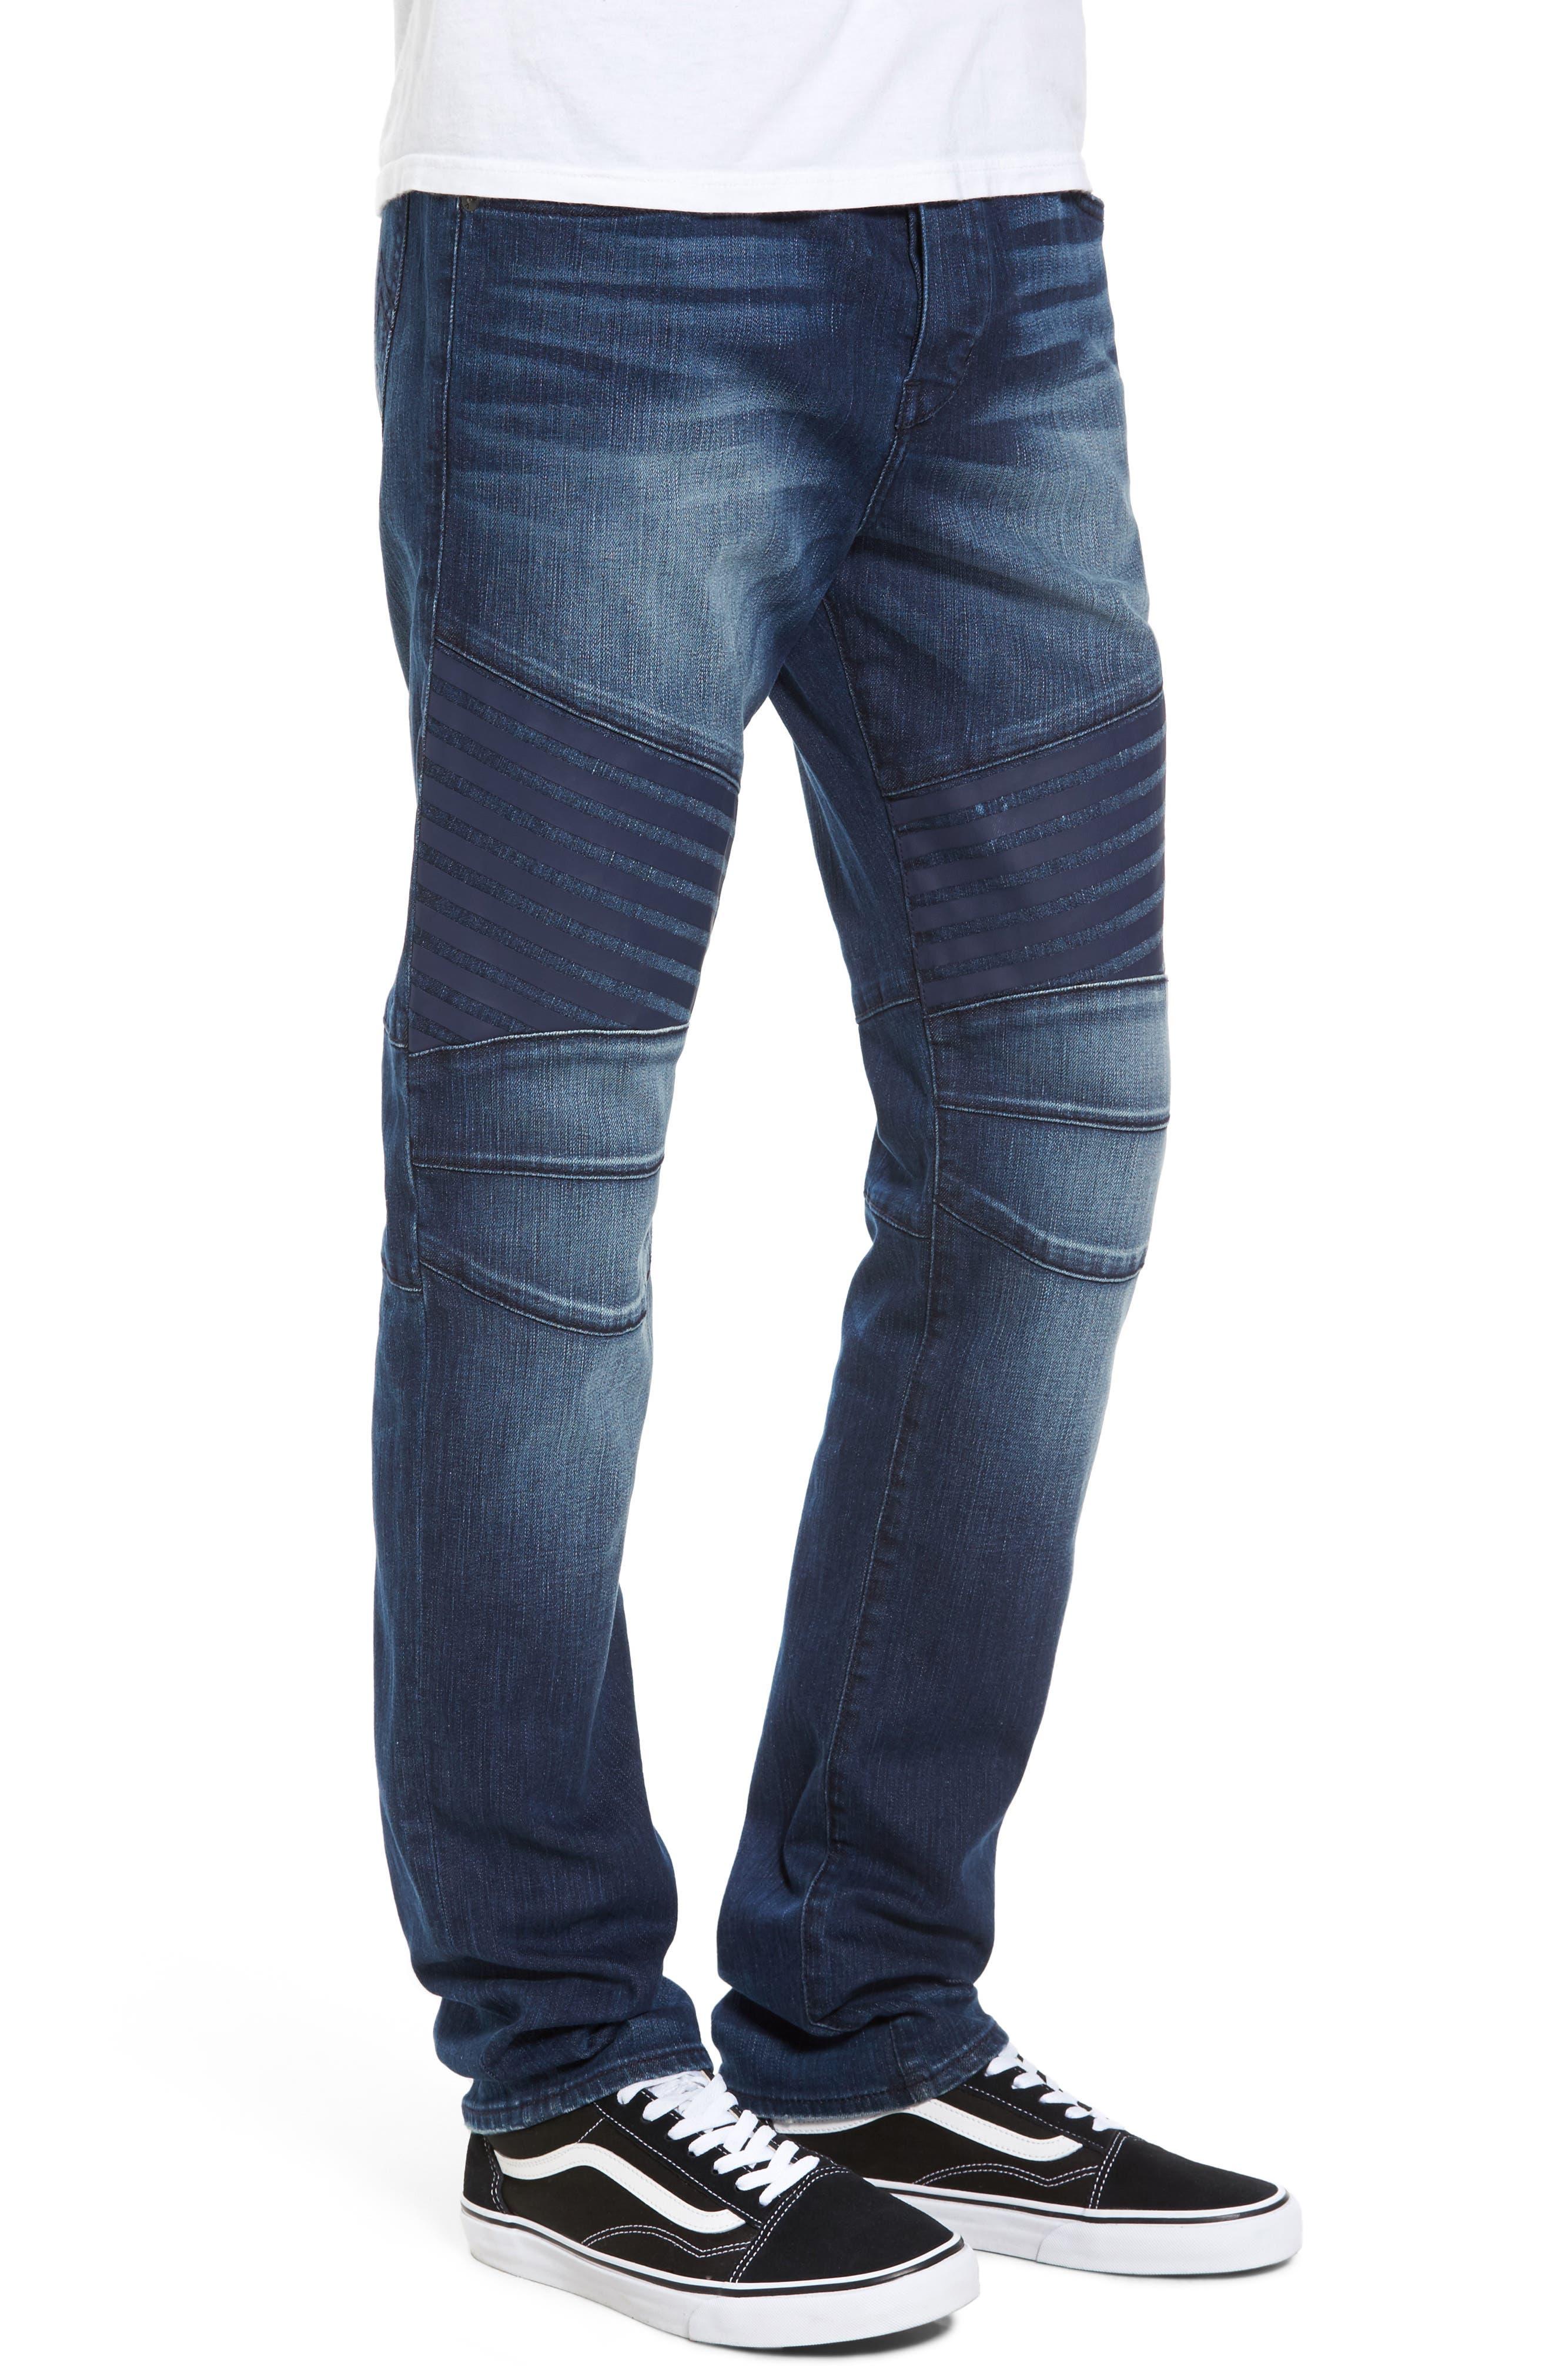 Alternate Image 3  - True Religion Brand Jeans Rocco Biker Skinny Fit Jeans (Rebel Race)